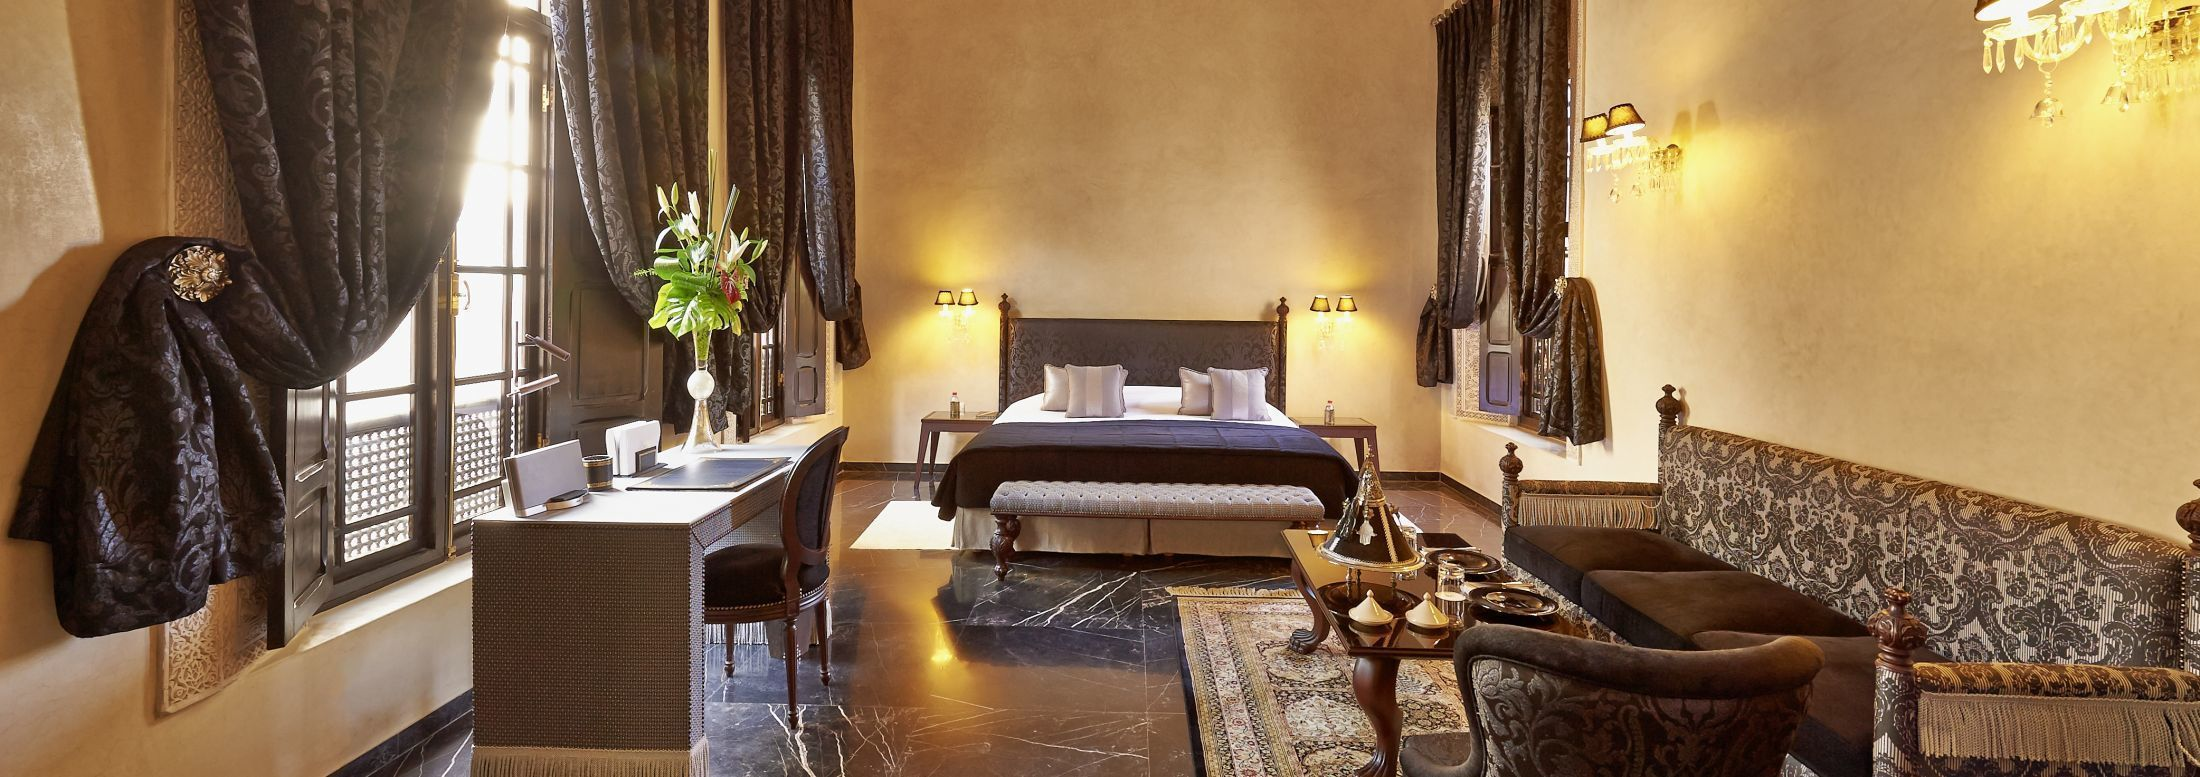 Riad Fes Hotel - Chambre